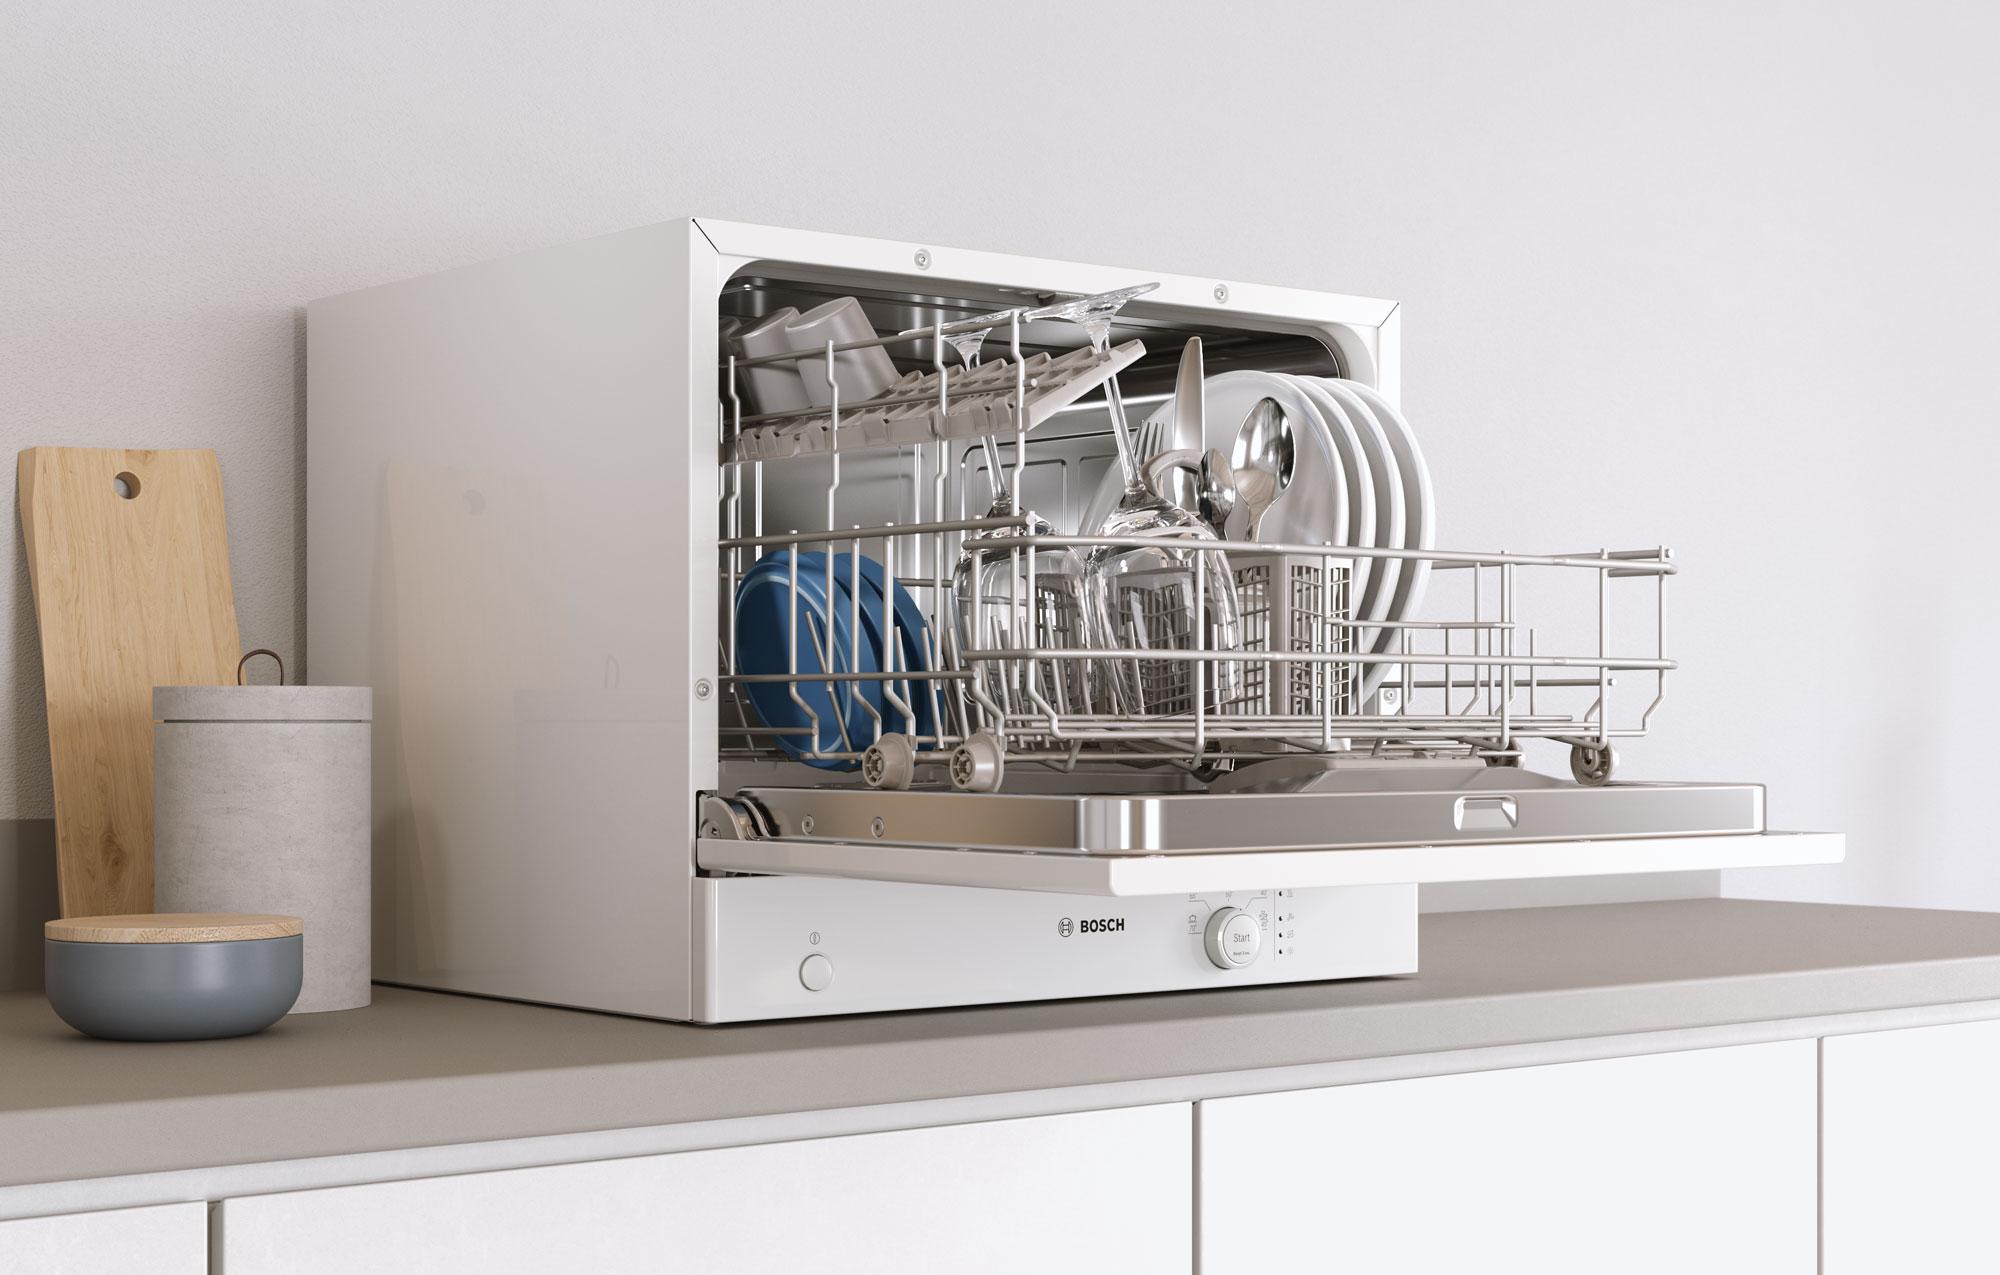 CGI - Bosch - Home Appliances - Freestanding Dishwasher